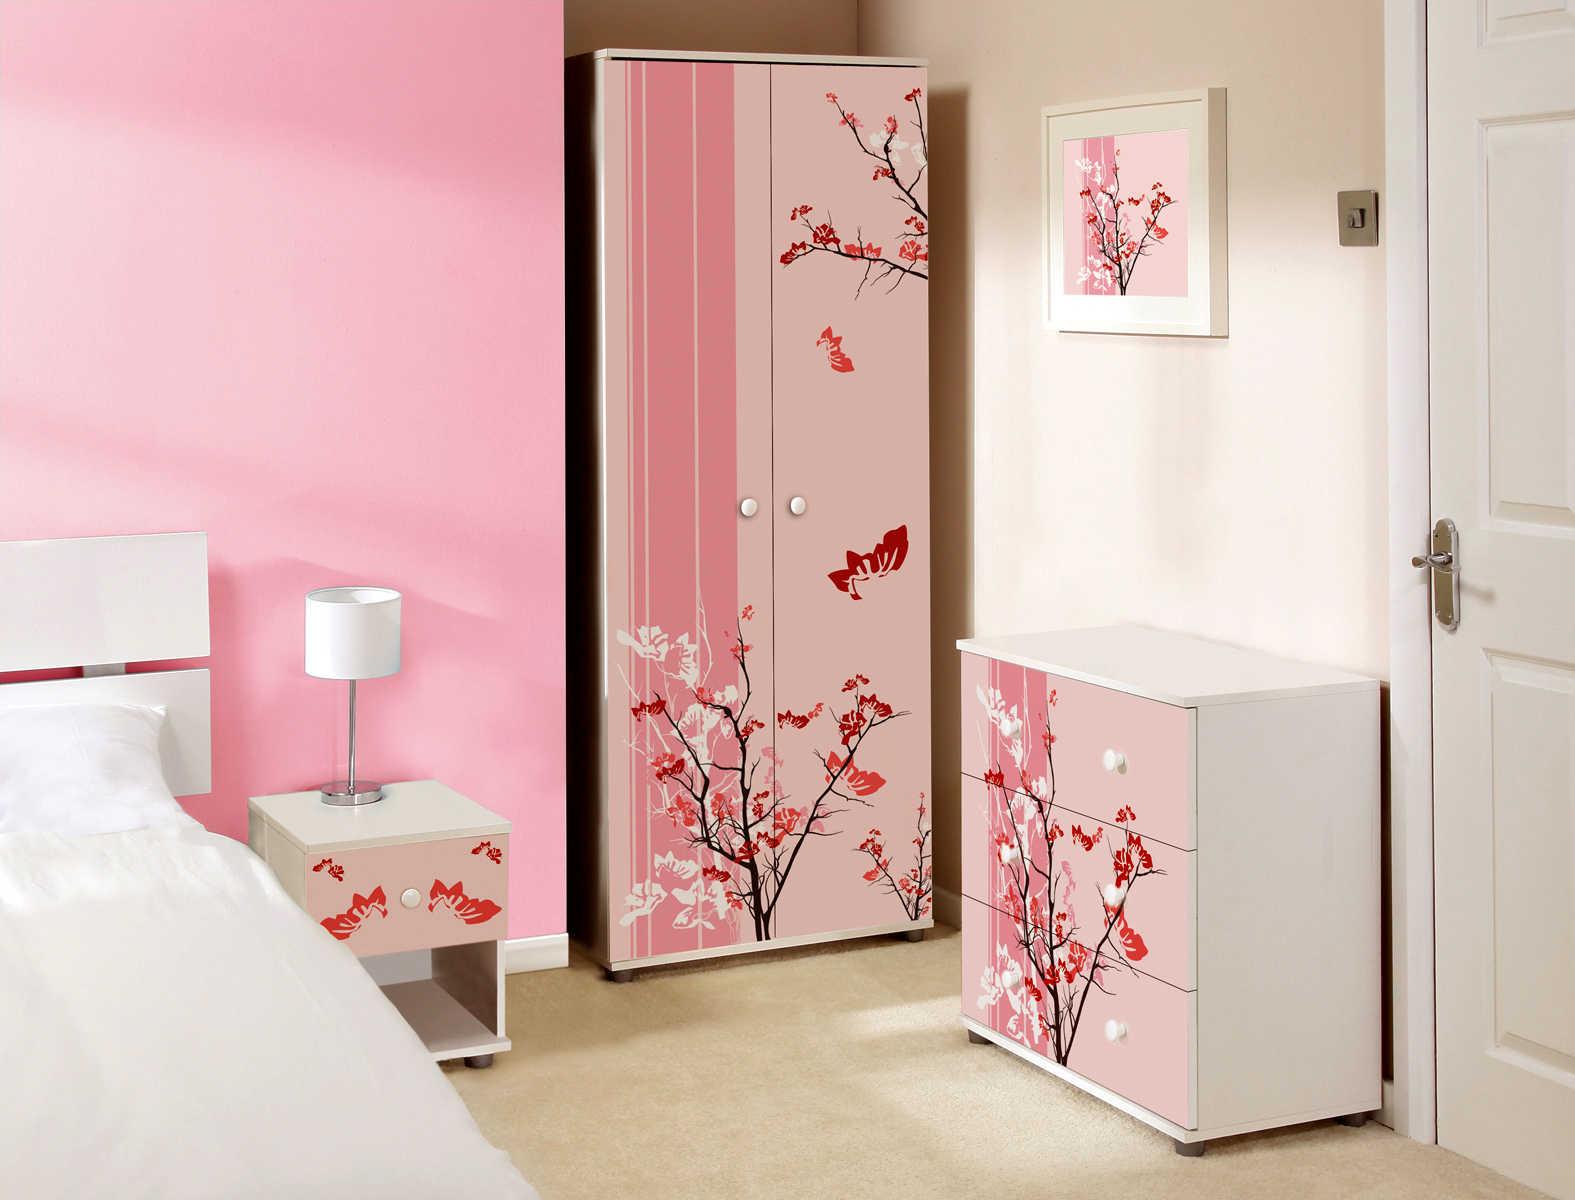 Pink Bedroom Ideas | My Decorative on Room Decor.  id=27413